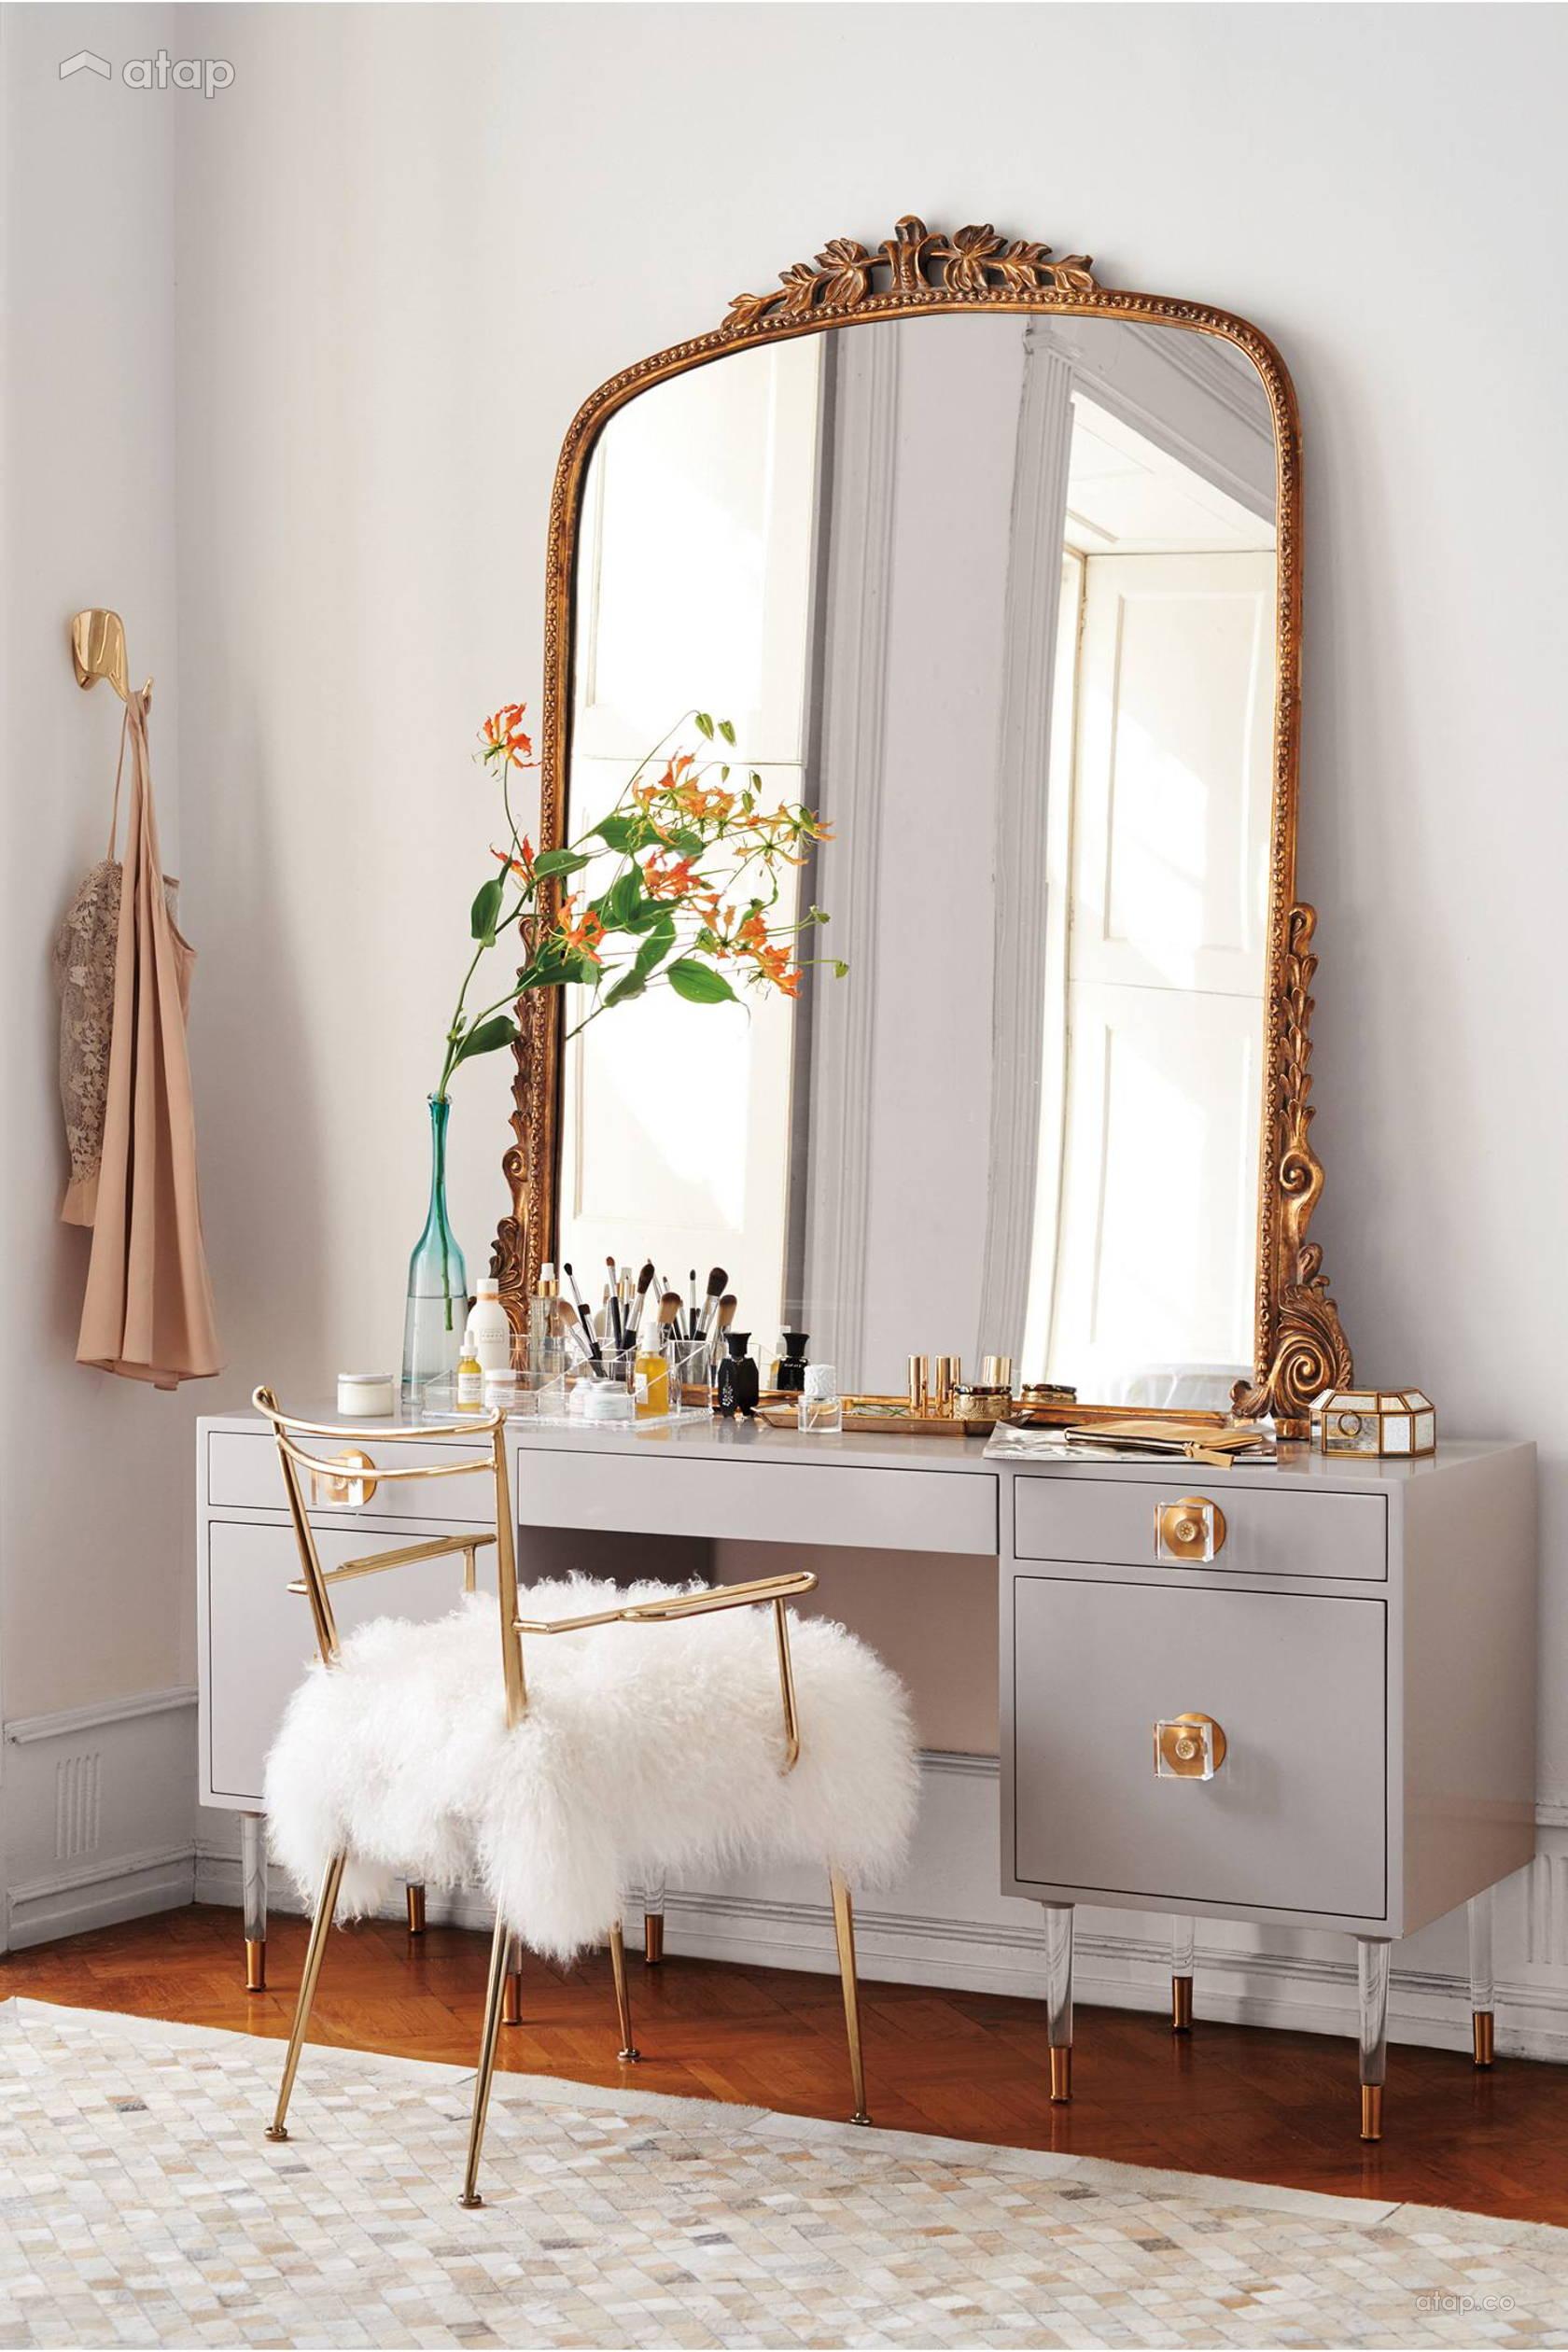 coiffeuse decoration miroir chambre